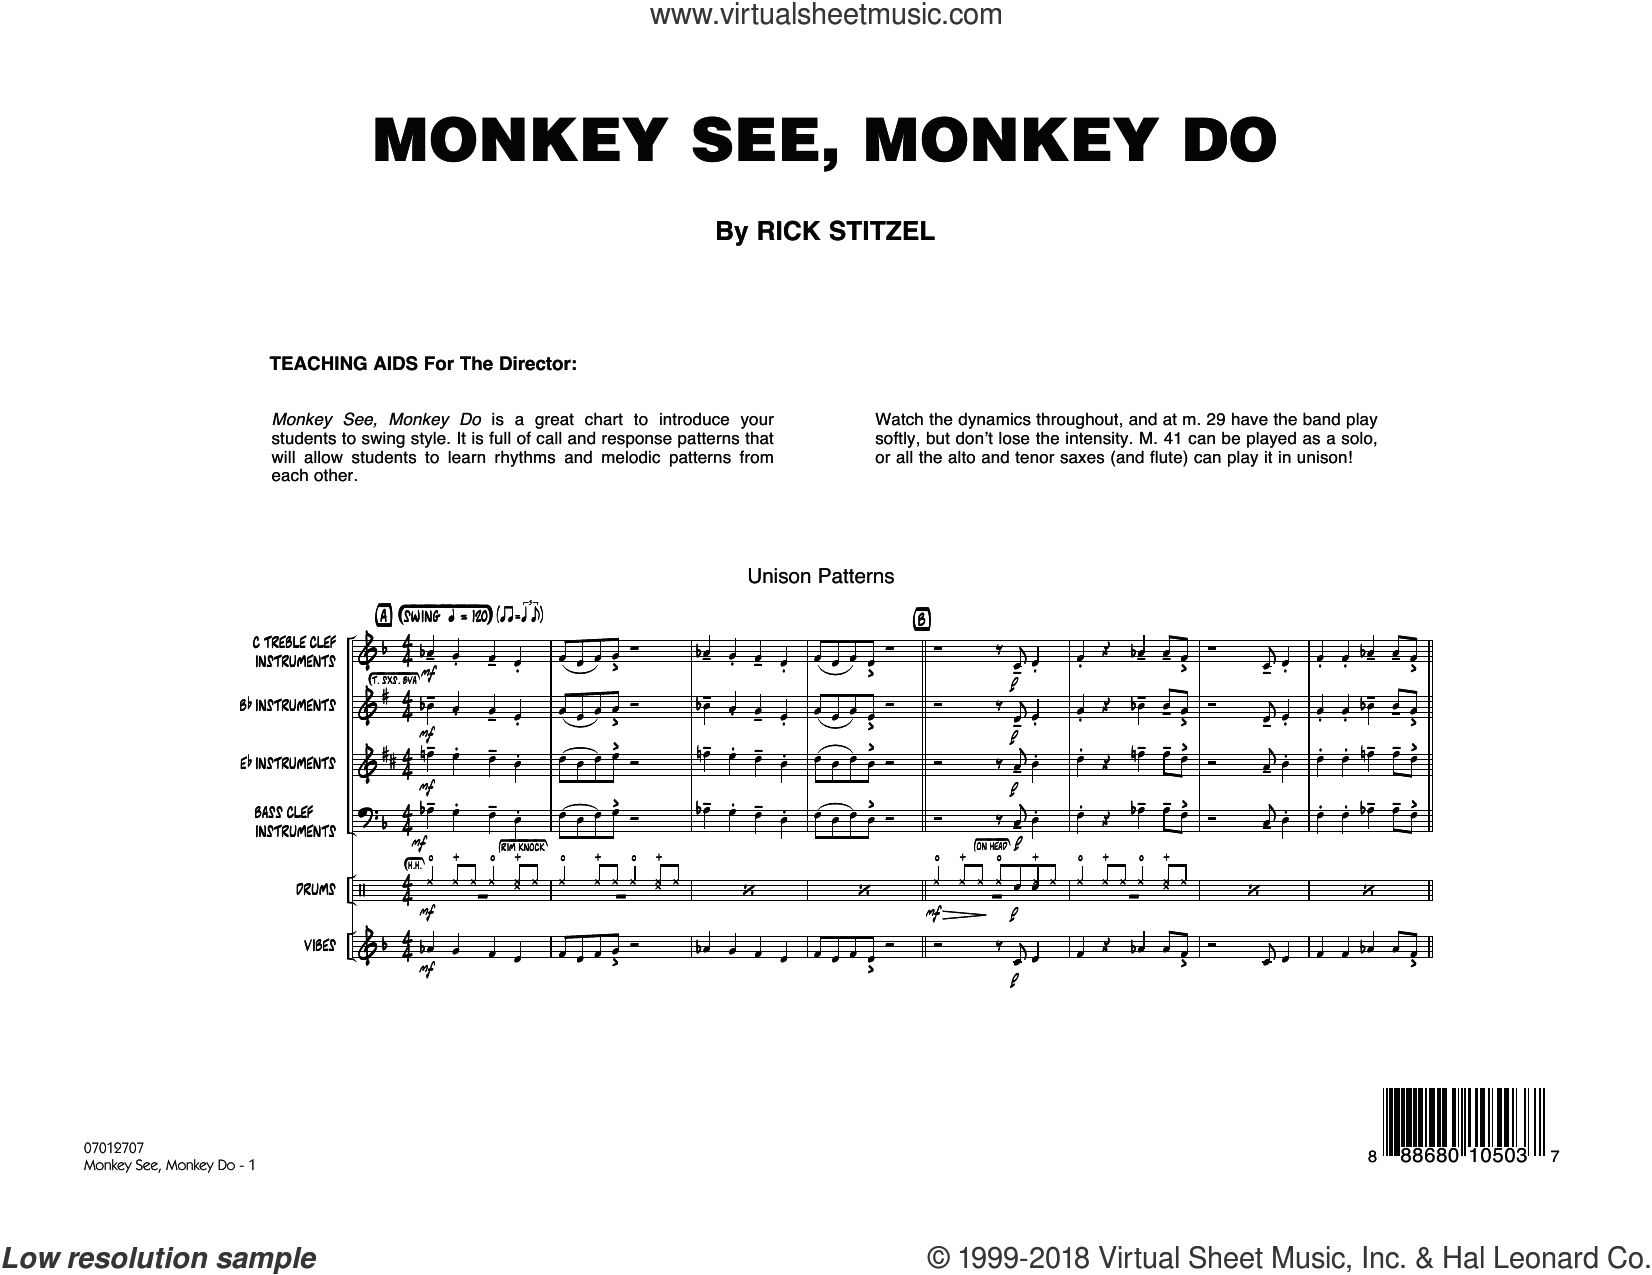 Monkey See, Monkey Do (COMPLETE) sheet music for jazz band by Rick Stitzel, intermediate skill level